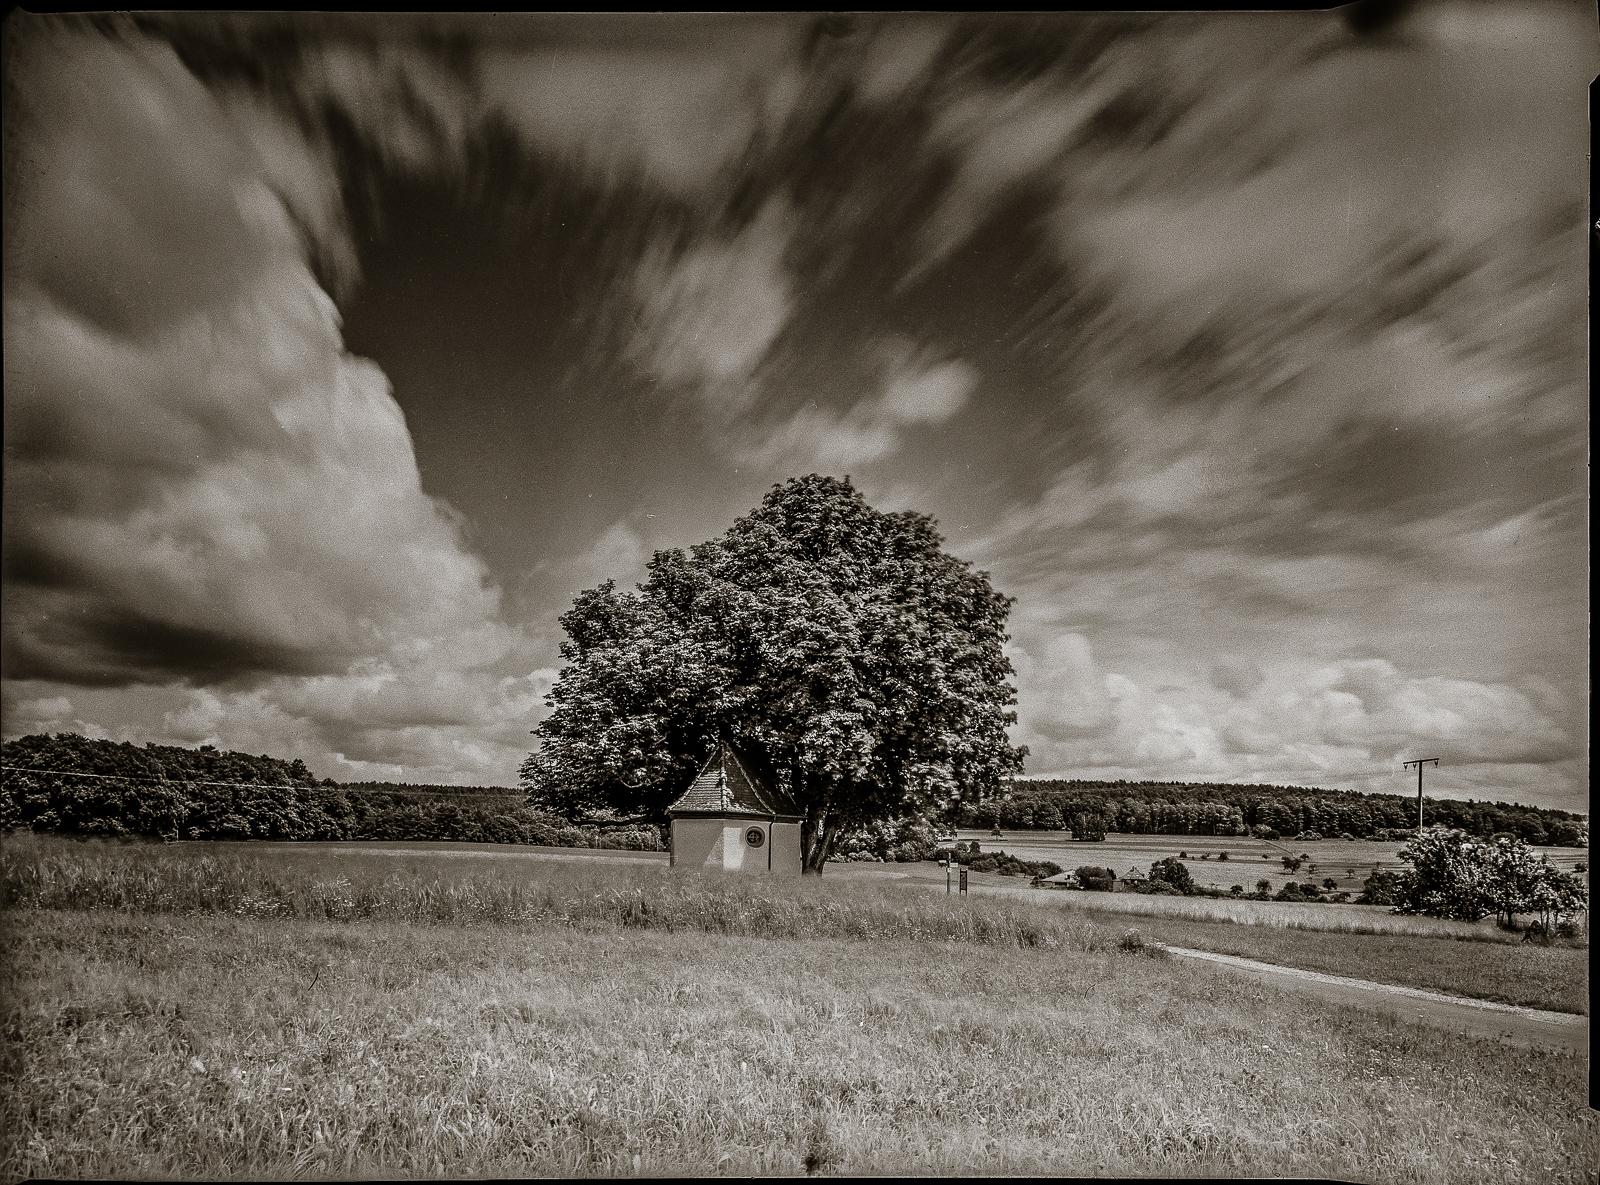 Kapelle unter Bäumen, starker Weitwinkel